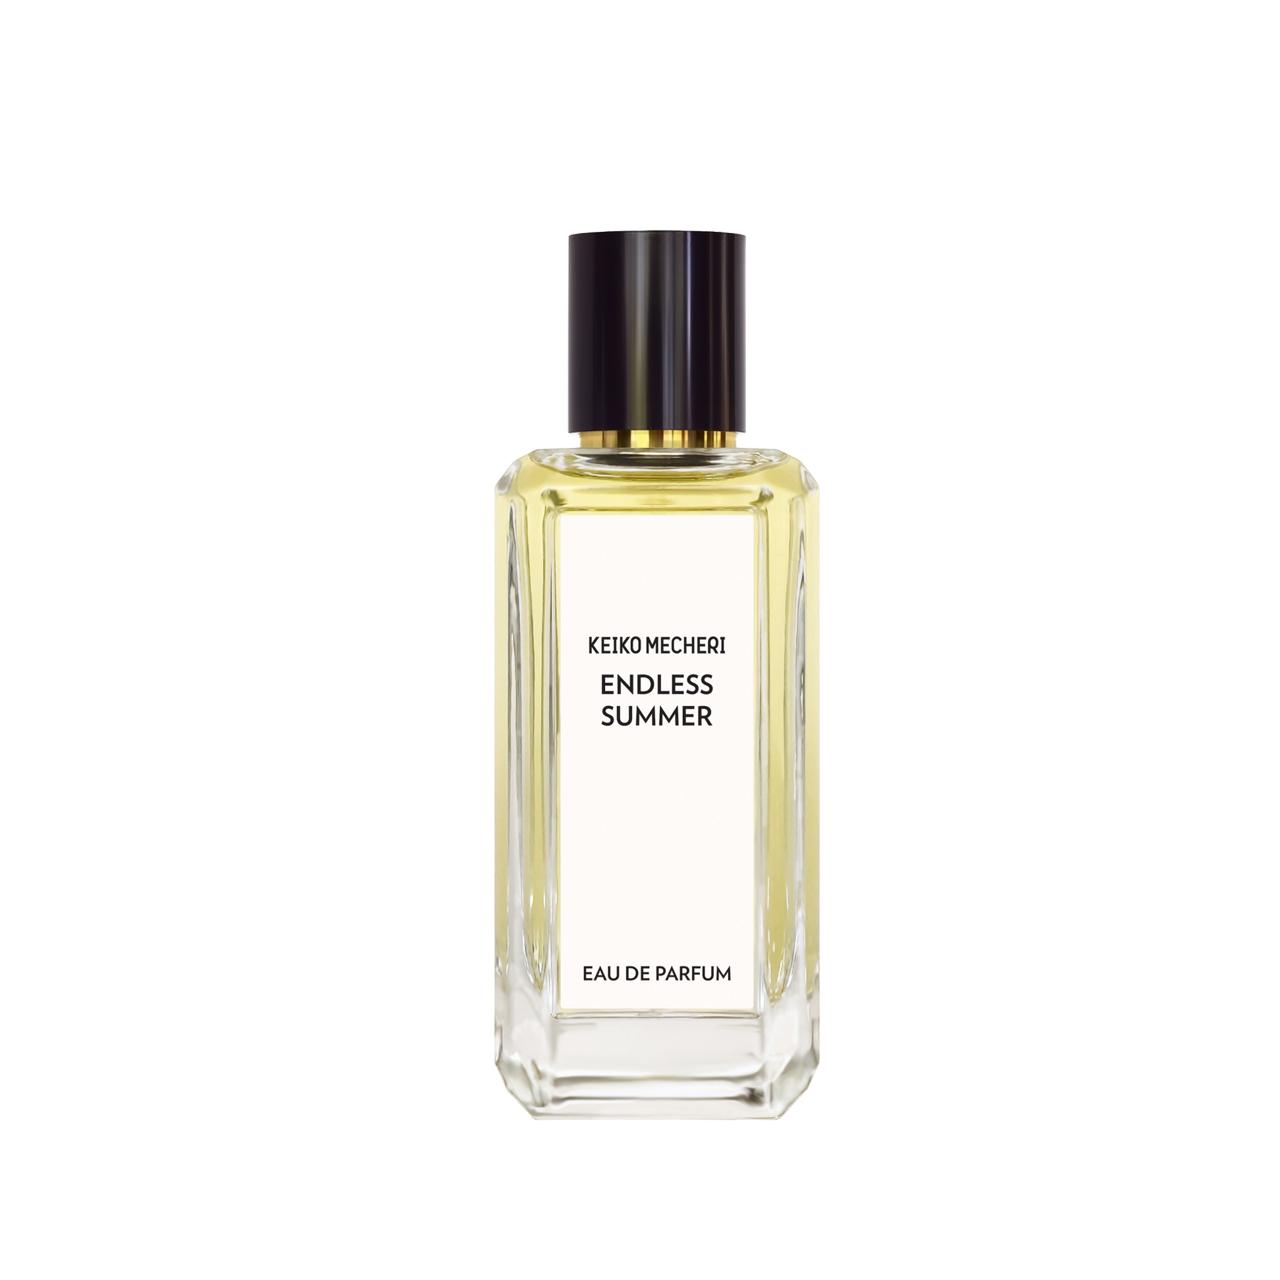 Endless Summer - Eau de Parfum